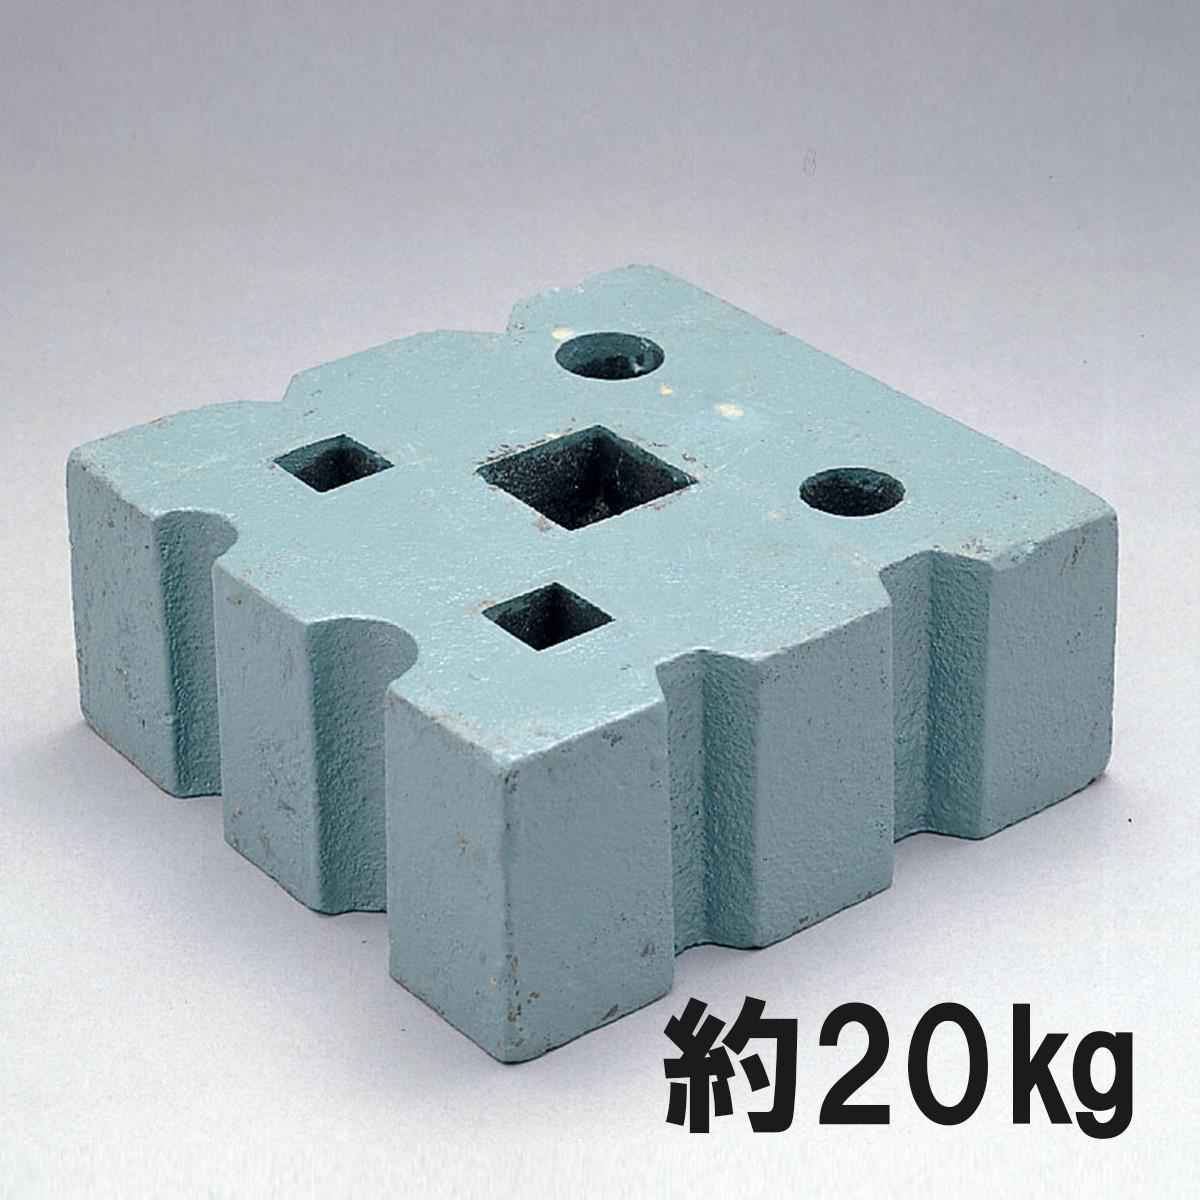 はちの巣床 約20kg 【 金属 工作 彫金 工芸 工具 金床 】